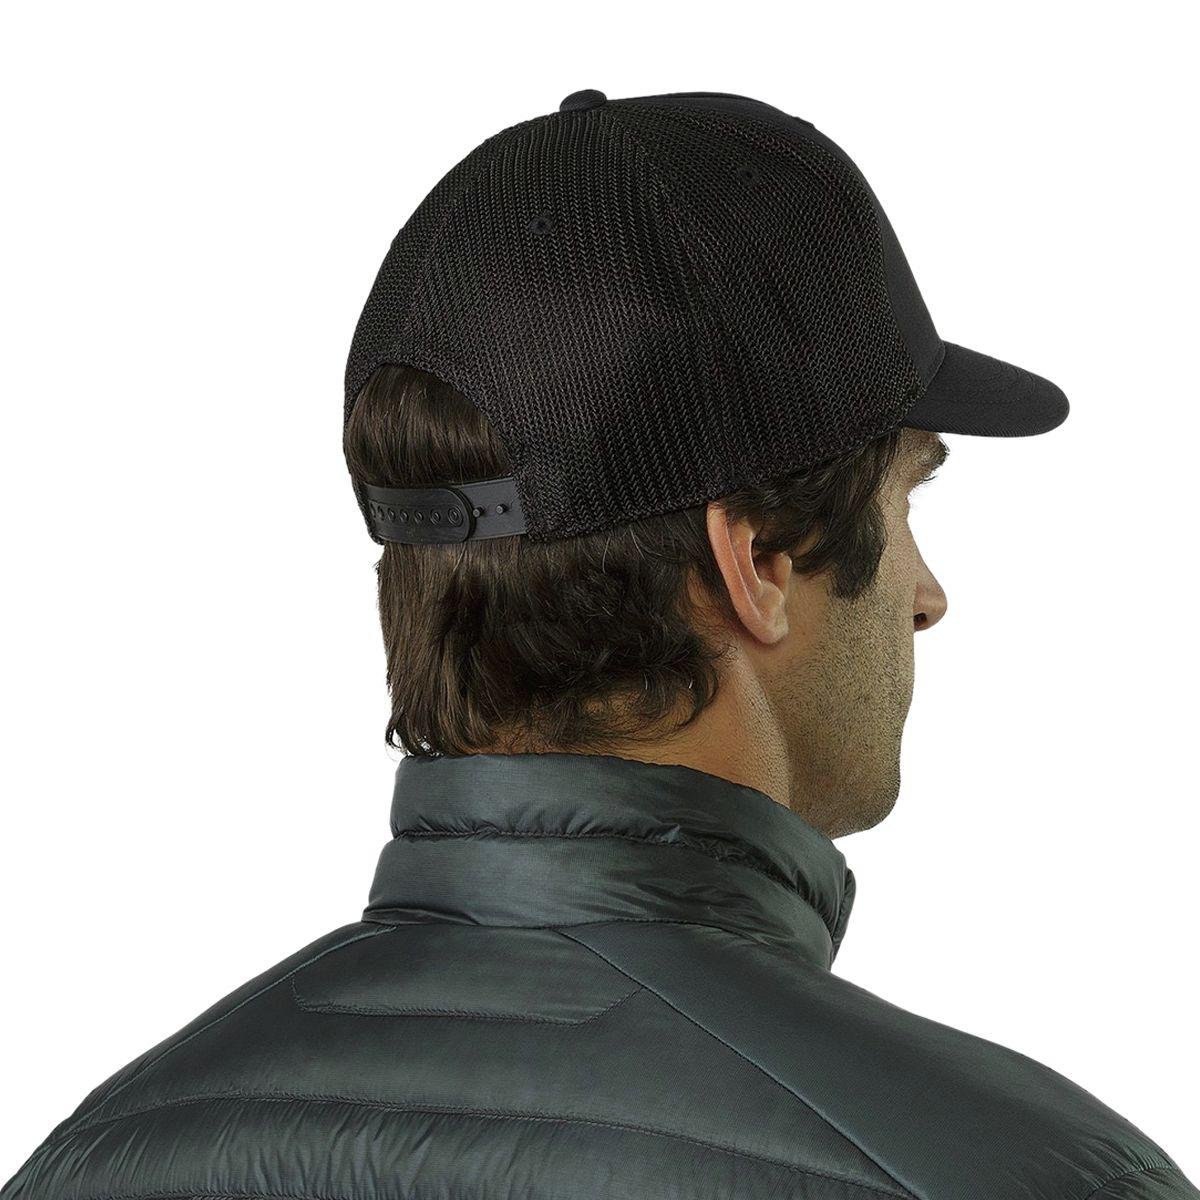 cd784ccd36c Lyst - Arc teryx Short Brim Trucker Hat in Black for Men